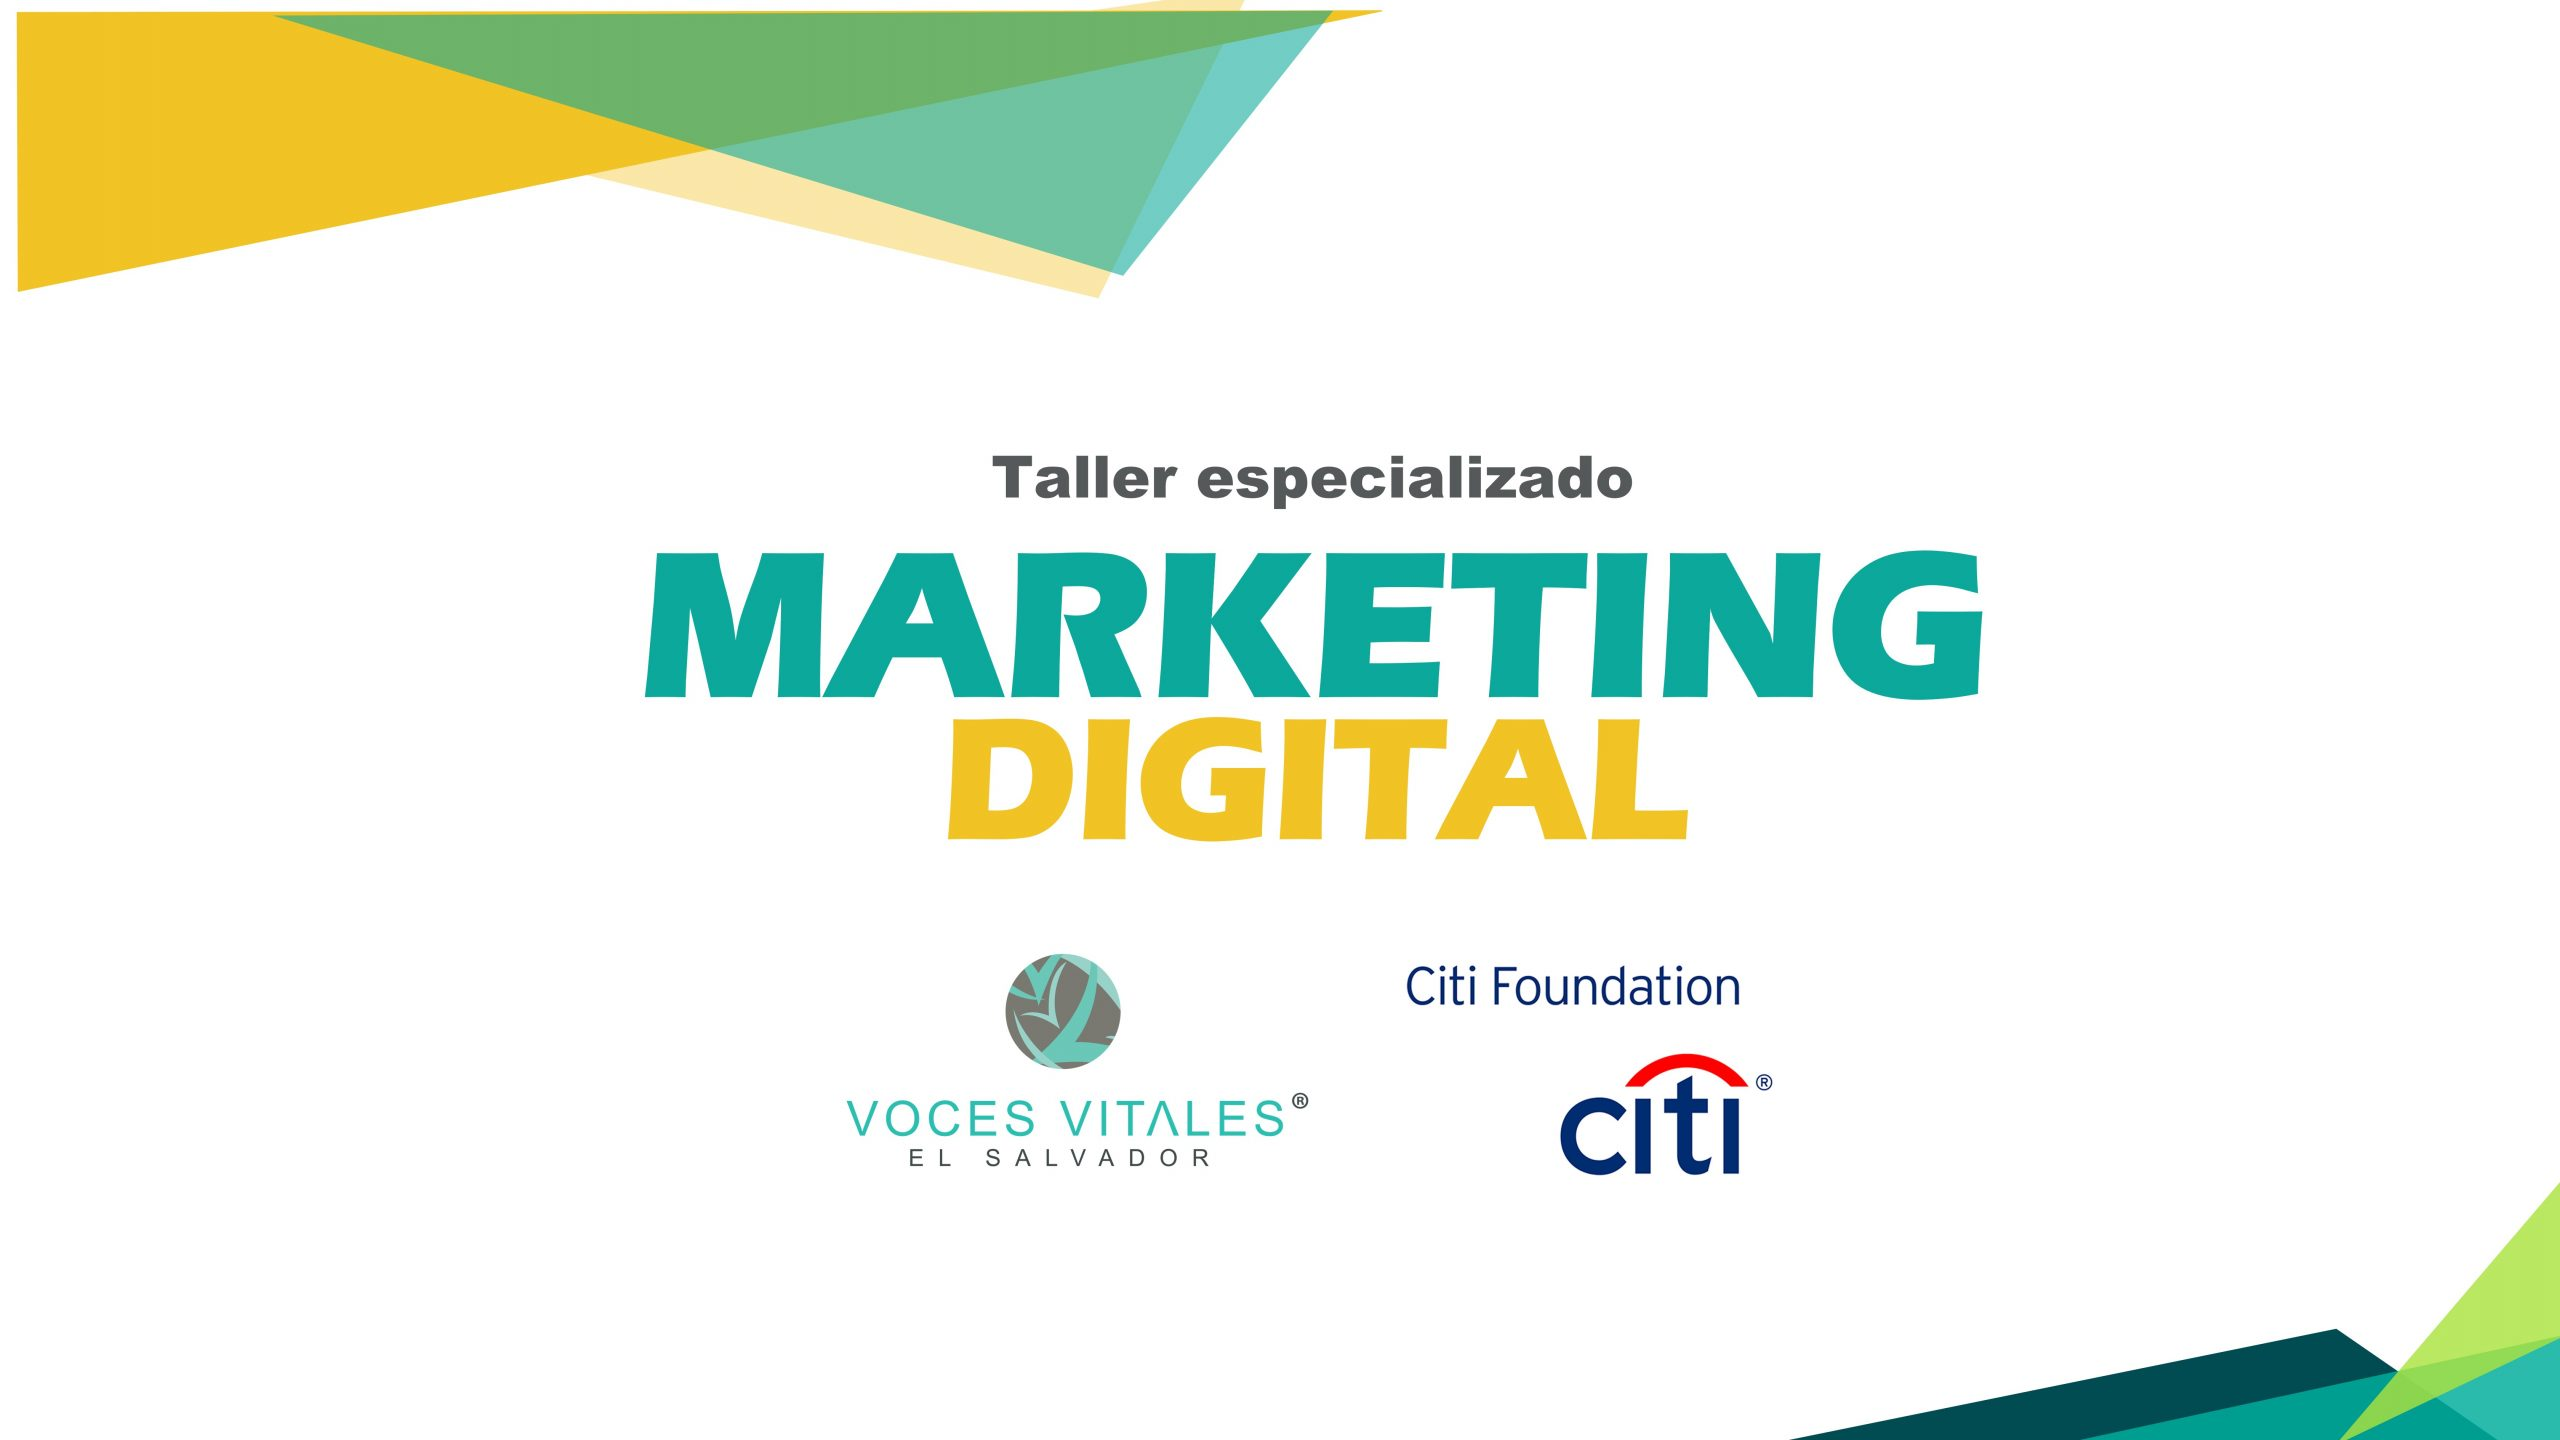 Taller Especializado: Marketing Digital